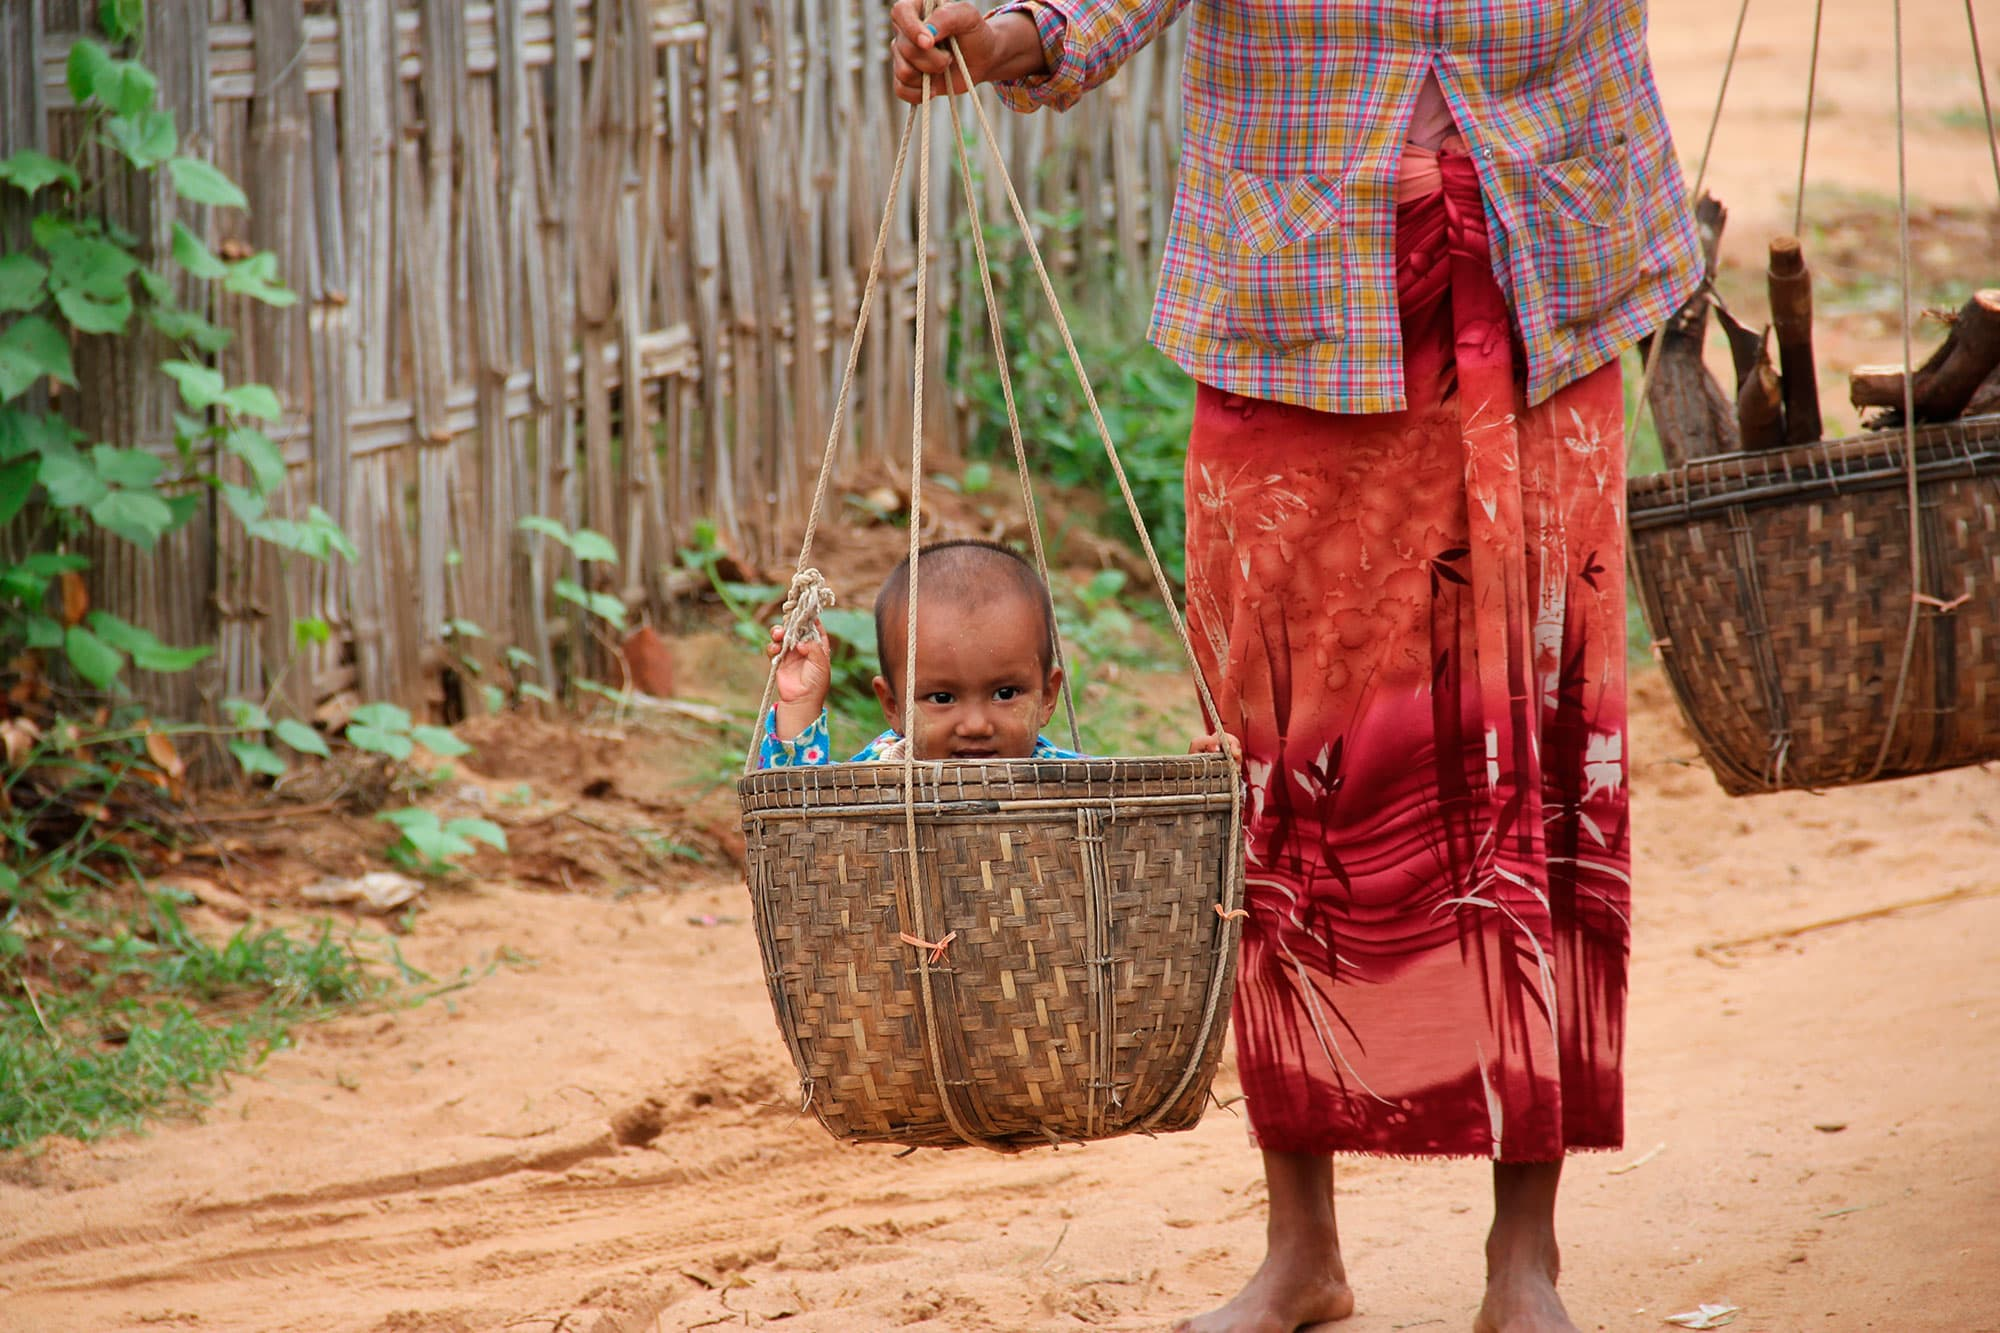 Myanmar espléndido, viaje de lujo - Myanmar- imagen #1